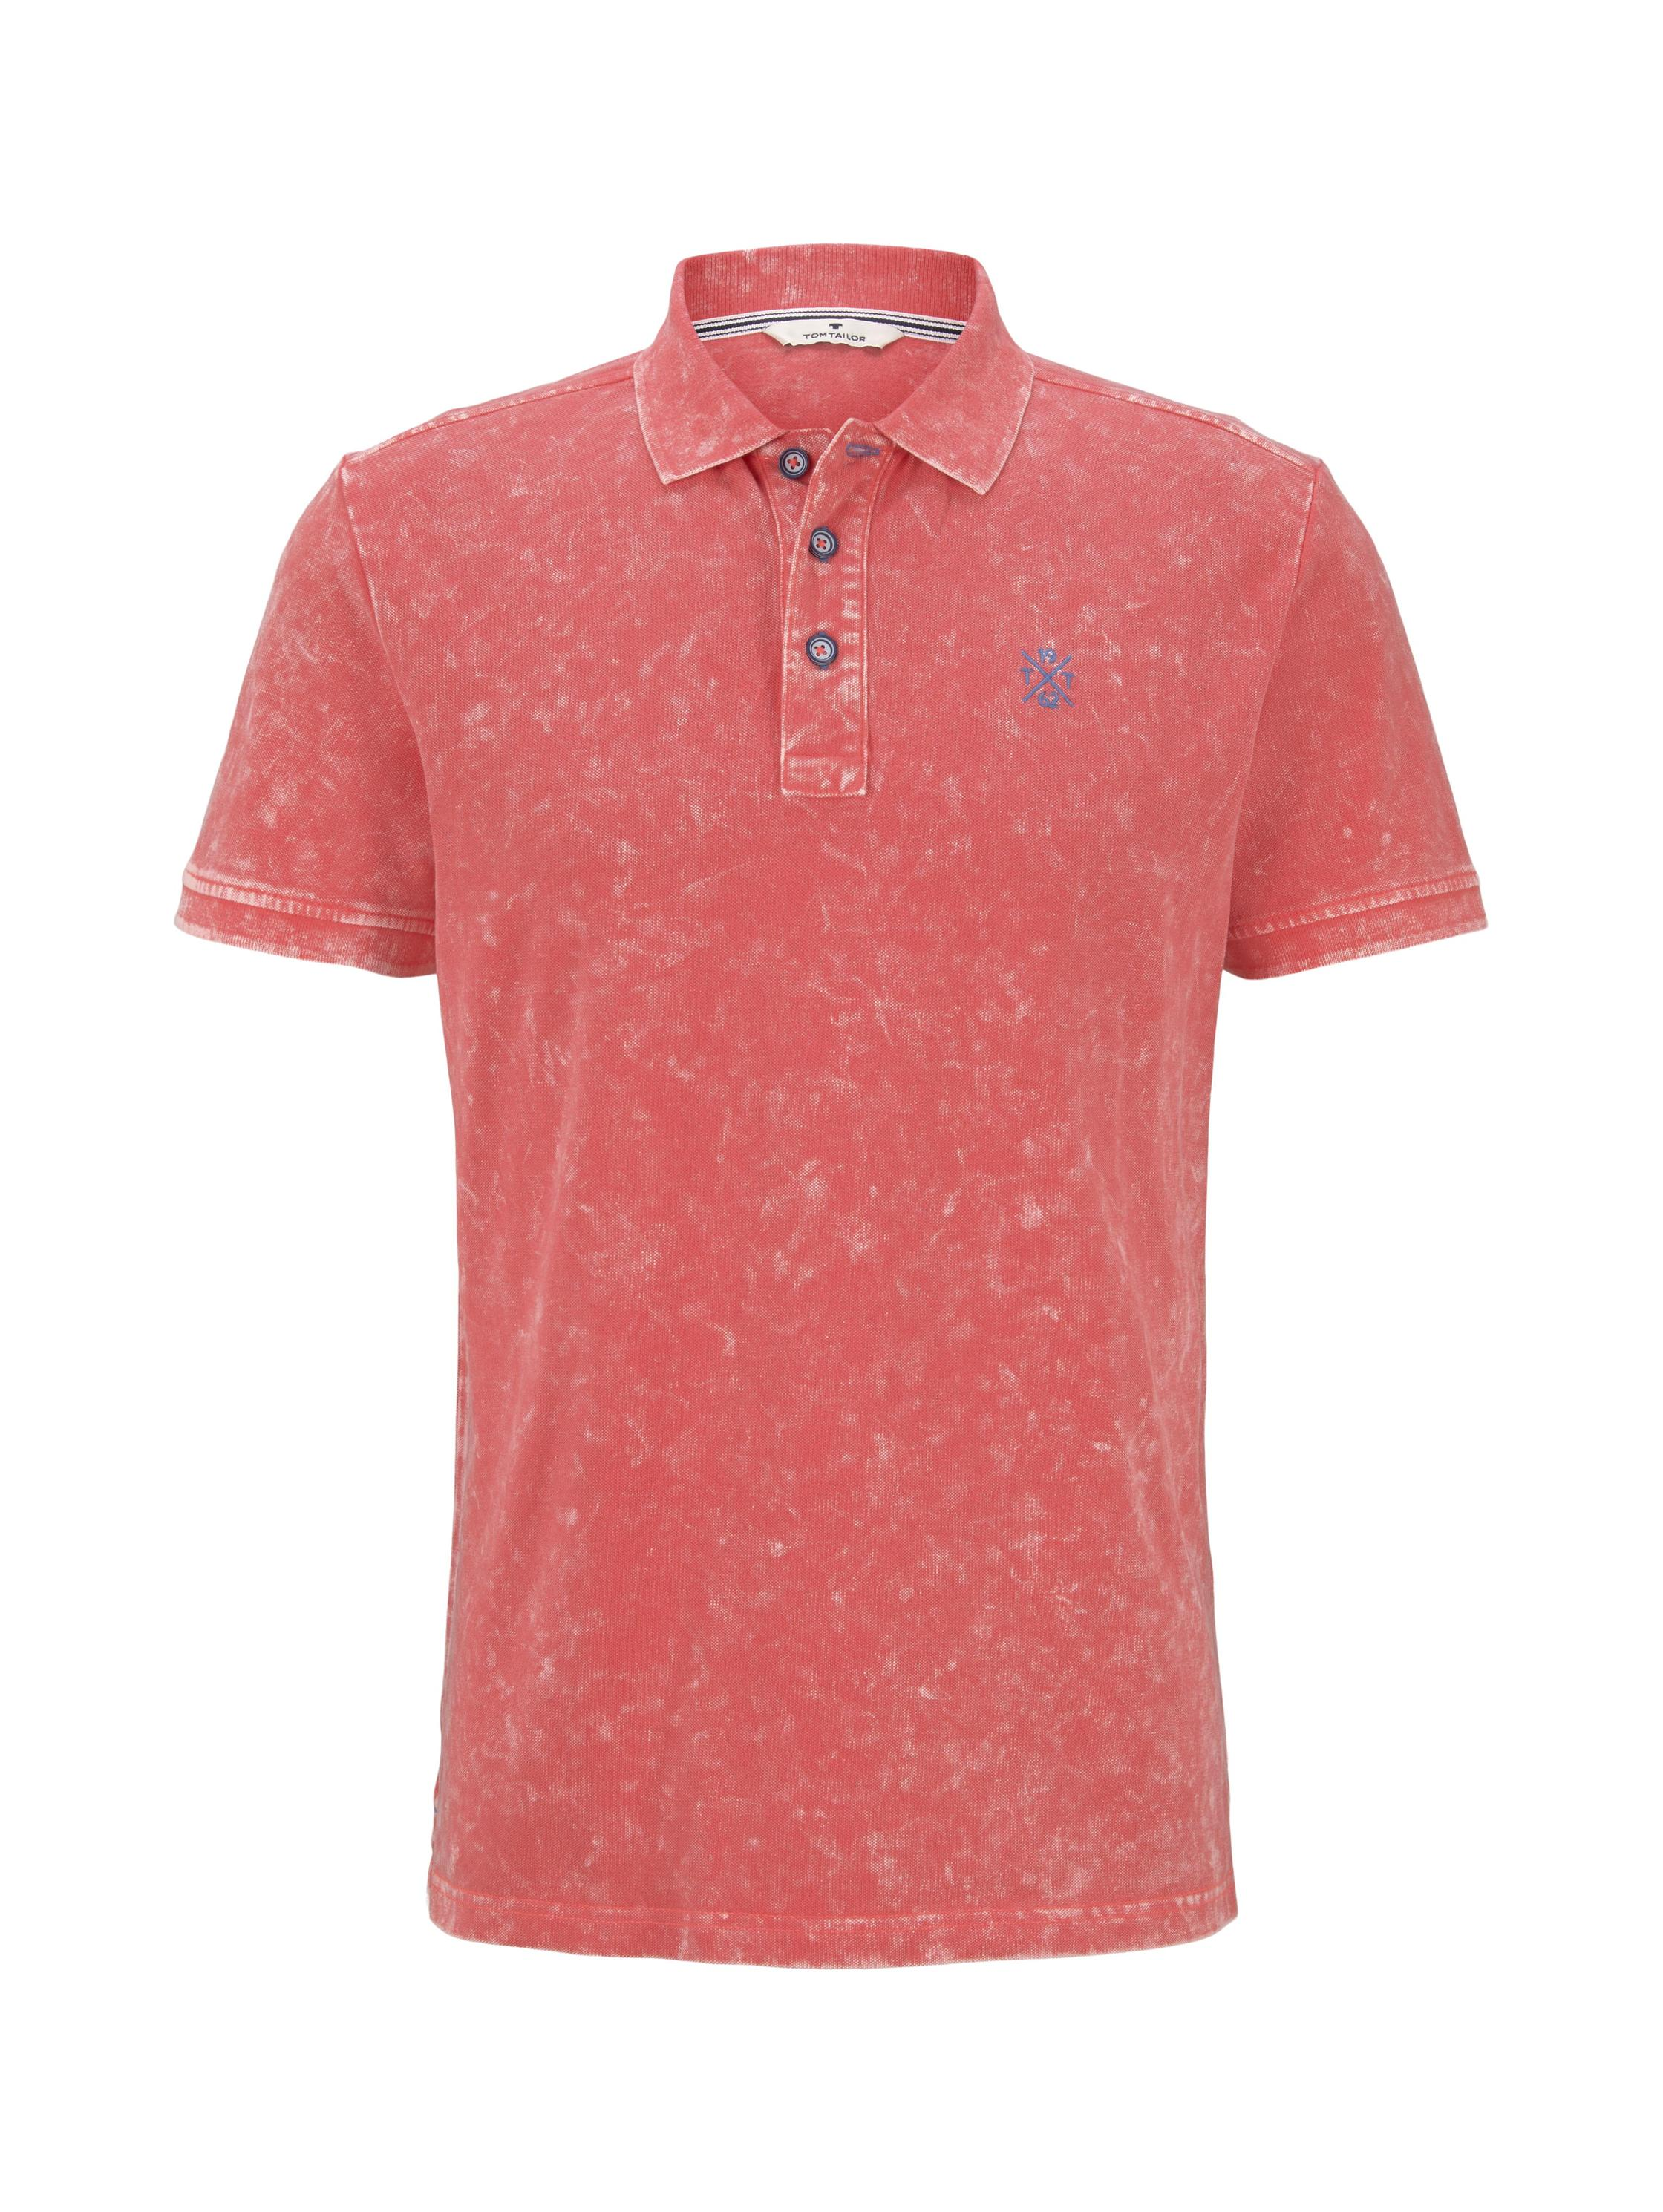 washed polo shirt, neon peach